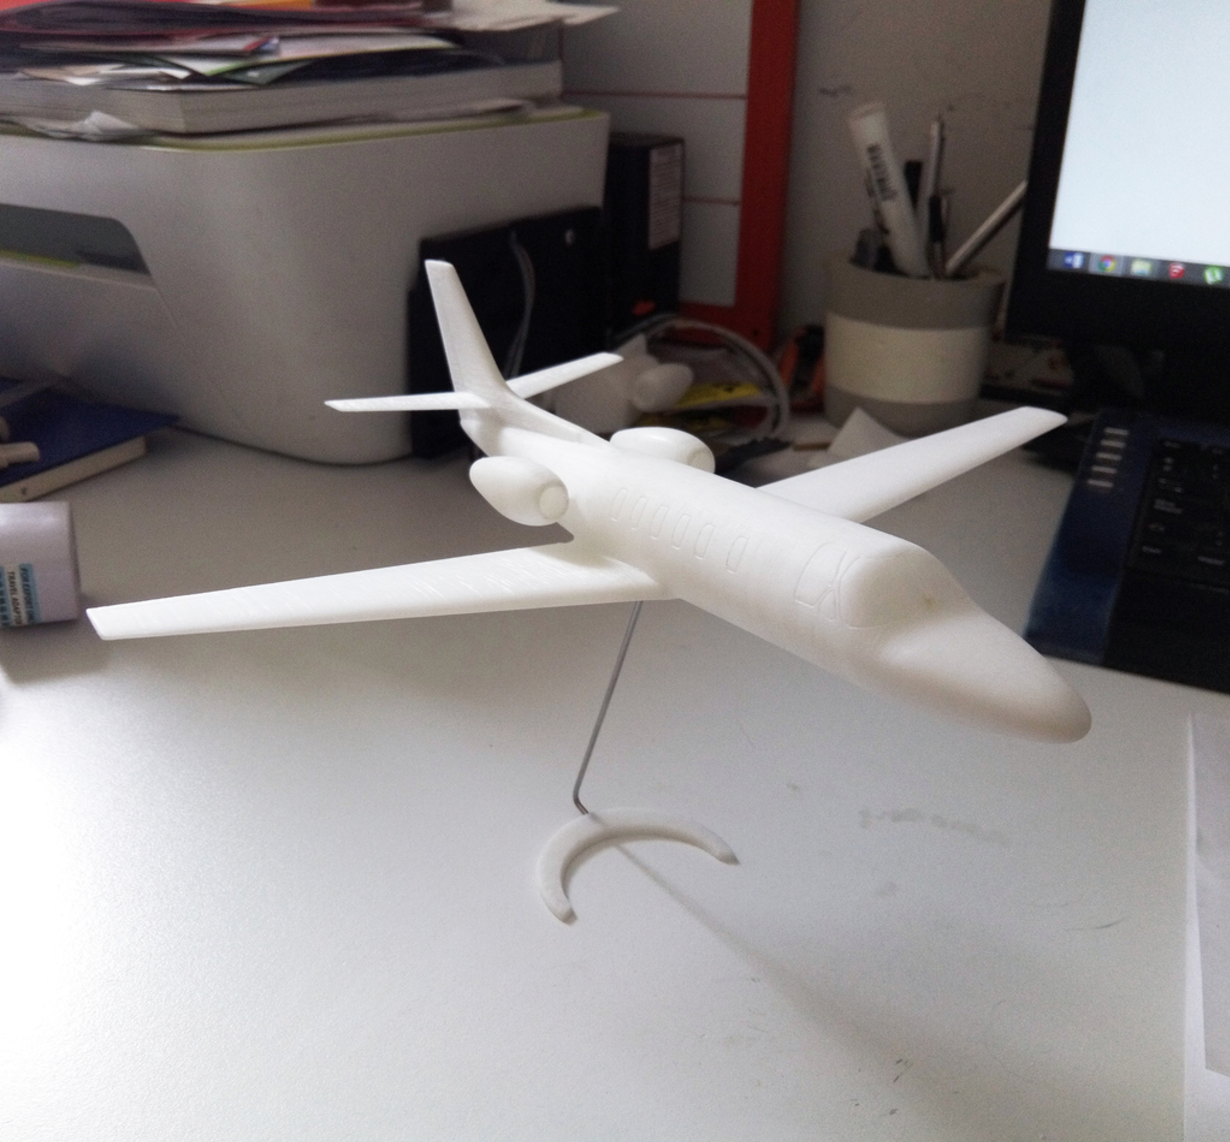 Capture d'écran 2017-04-25 à 19.12.35.png Download free STL file Easy to print Cessna Citation SII 1/64 aircraft scale model • 3D print template, guaro3d